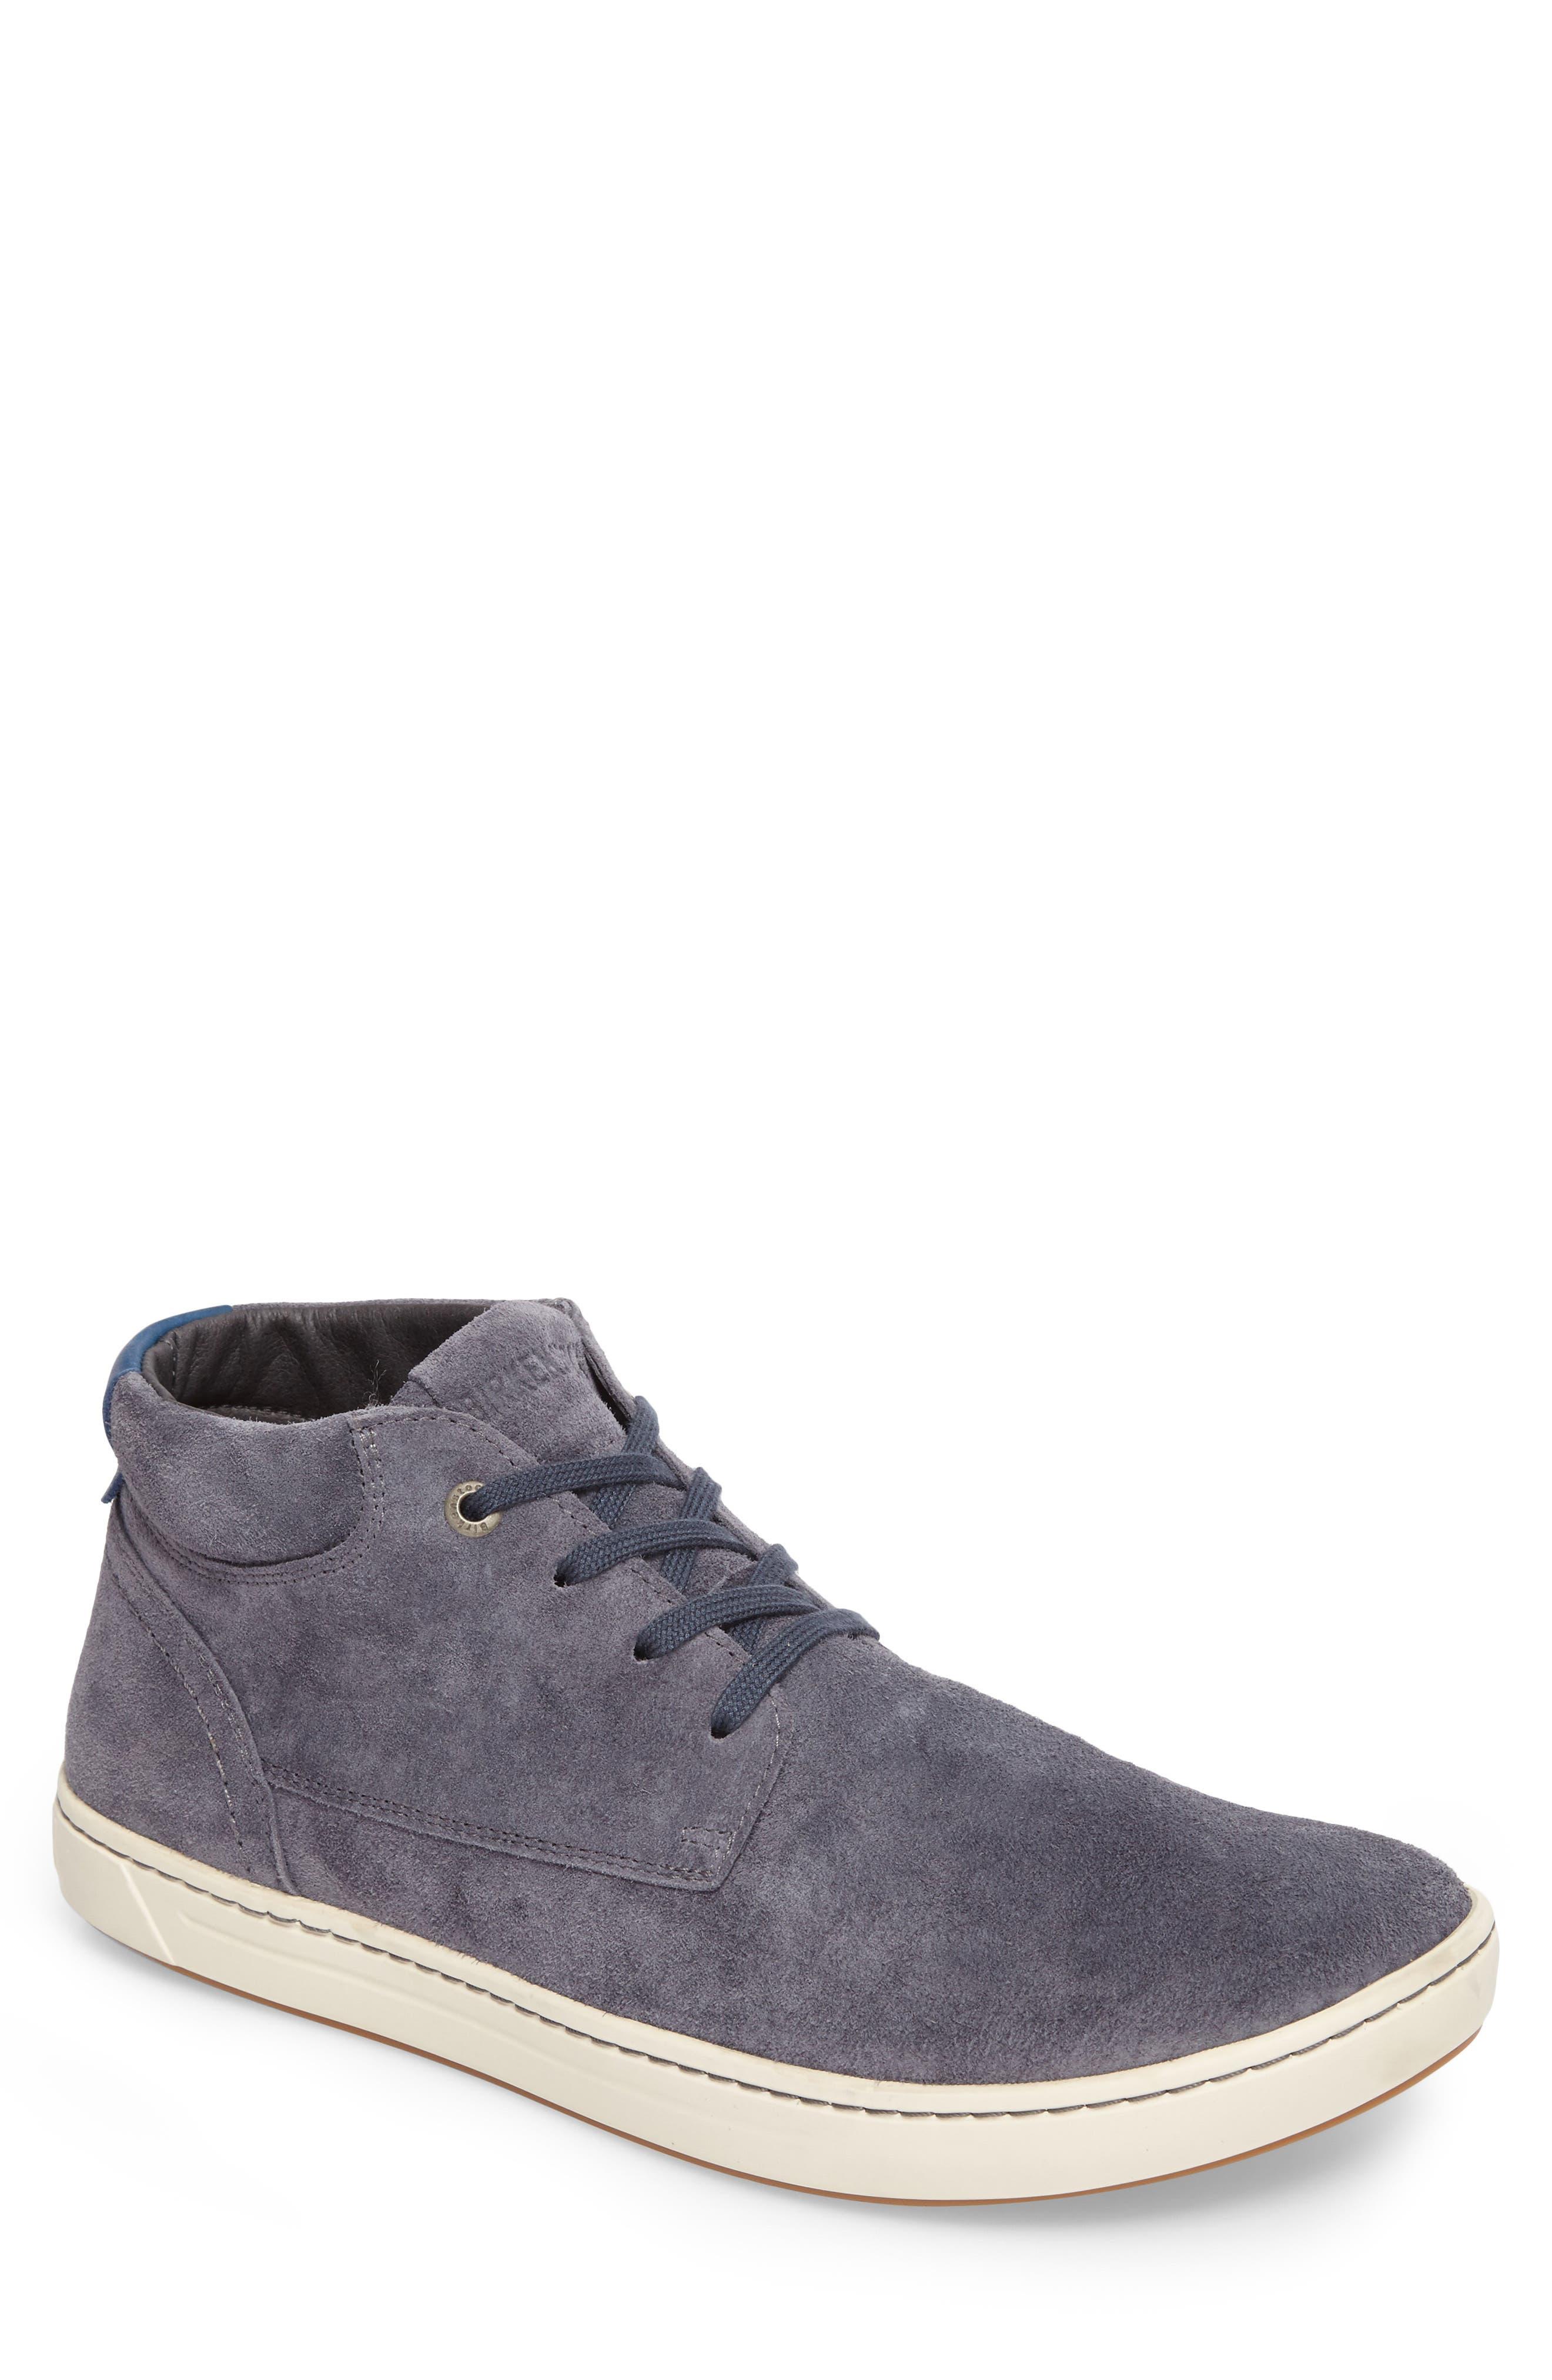 Birkenstock Brandon Sneaker, Blue